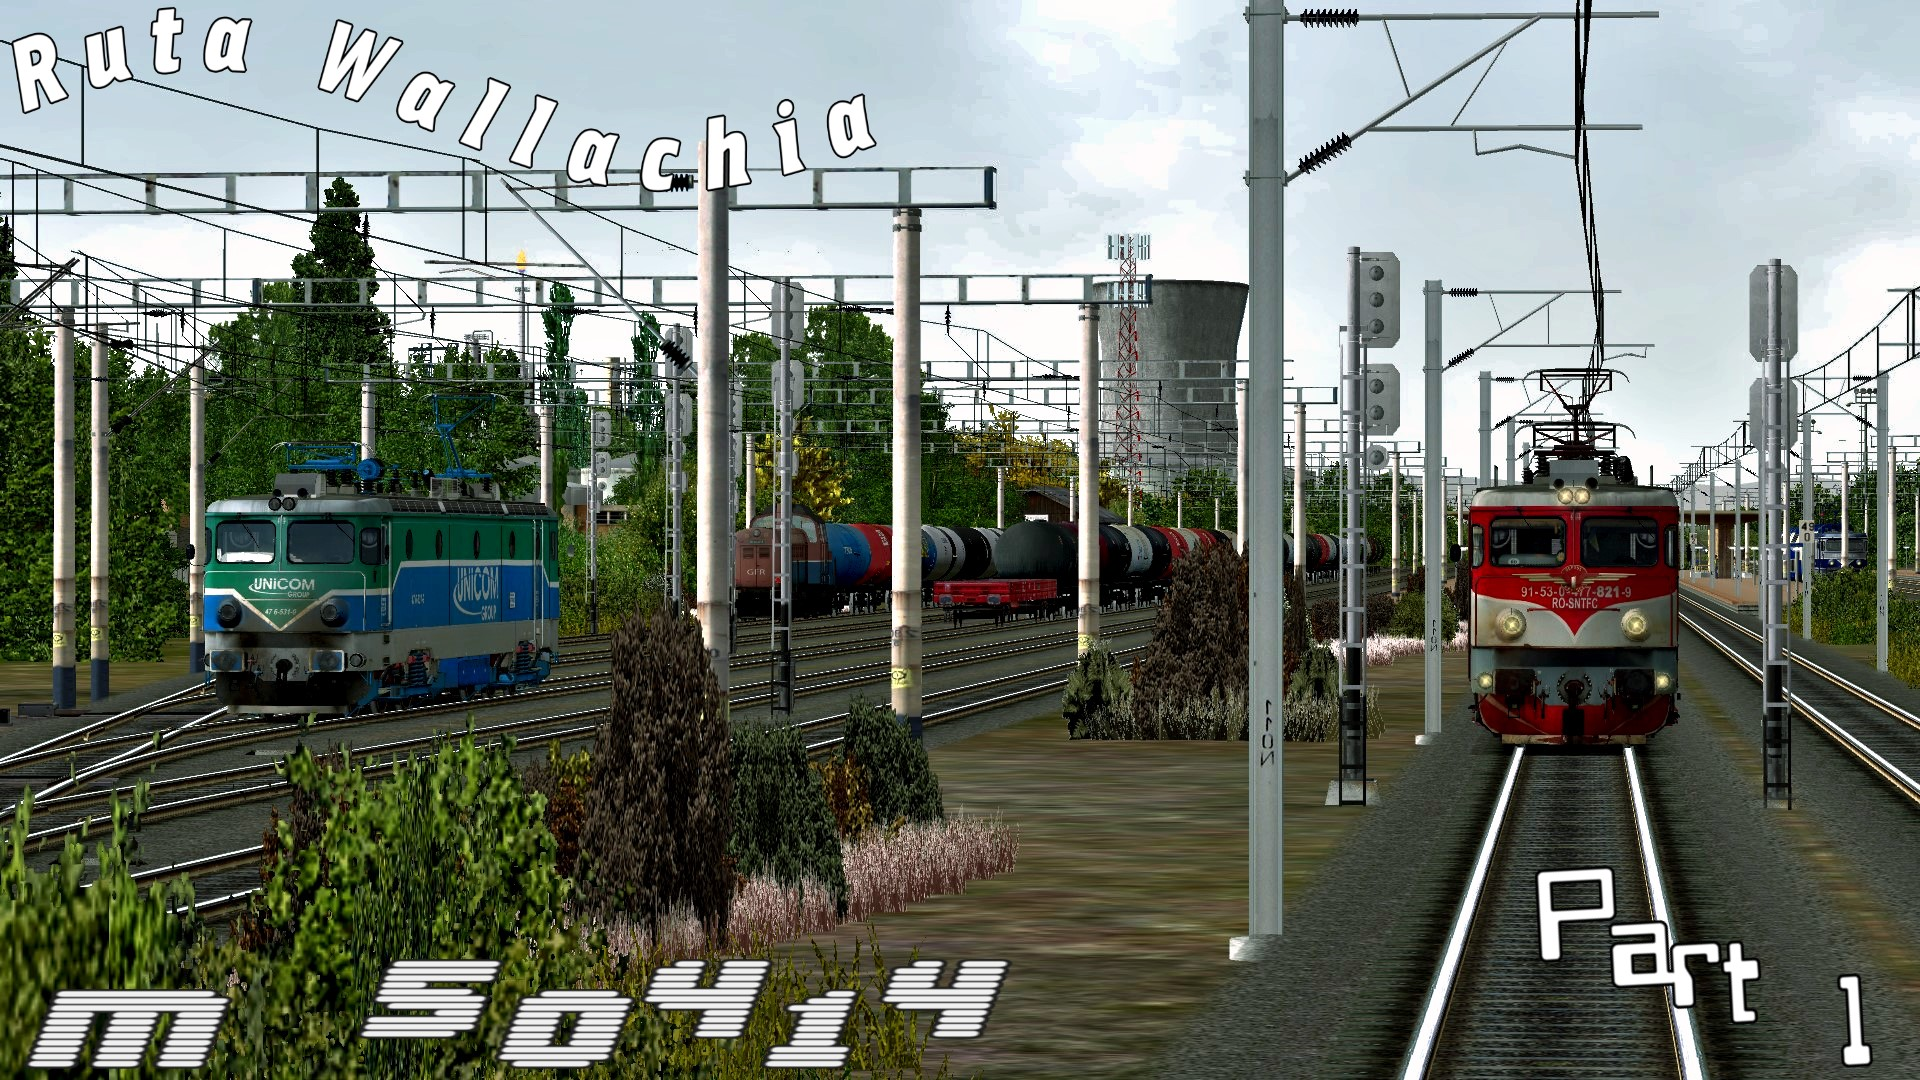 M50414